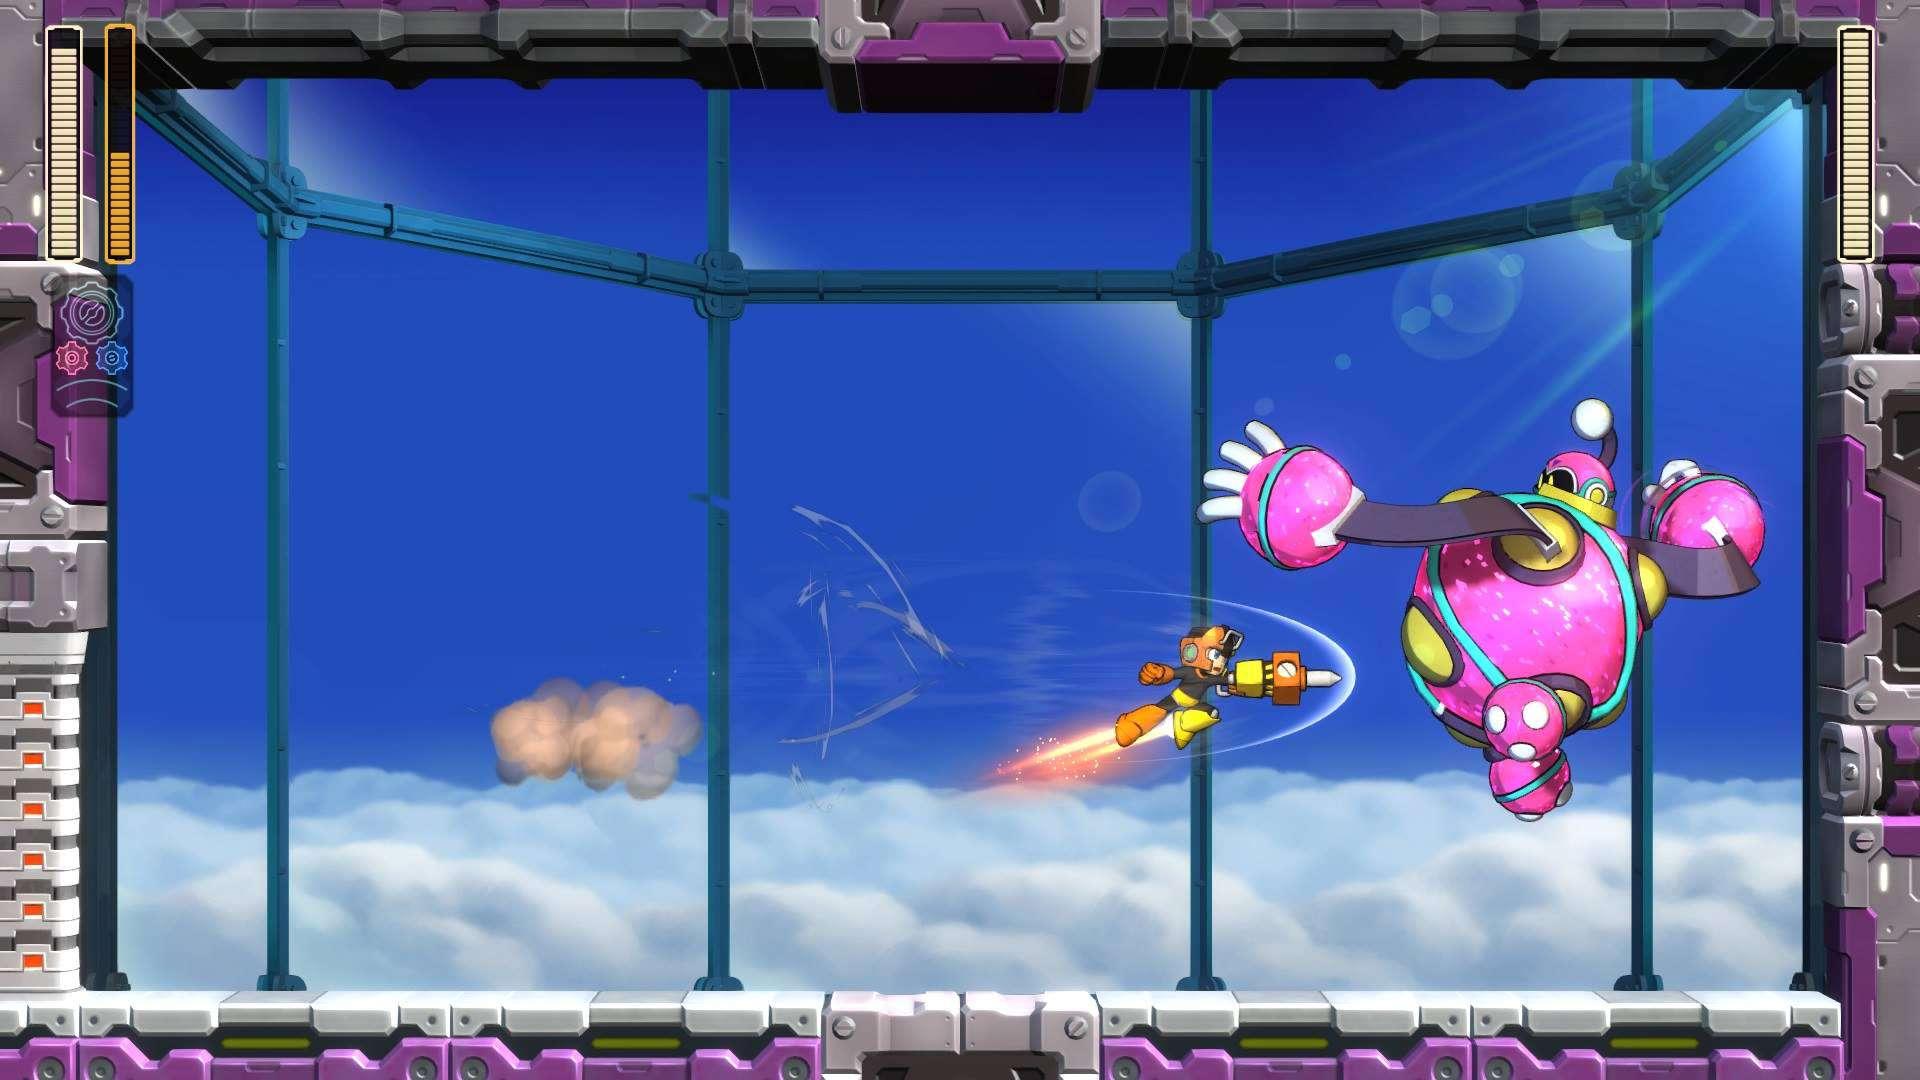 Mega Man attacks Bounce Man in Mega Man 11